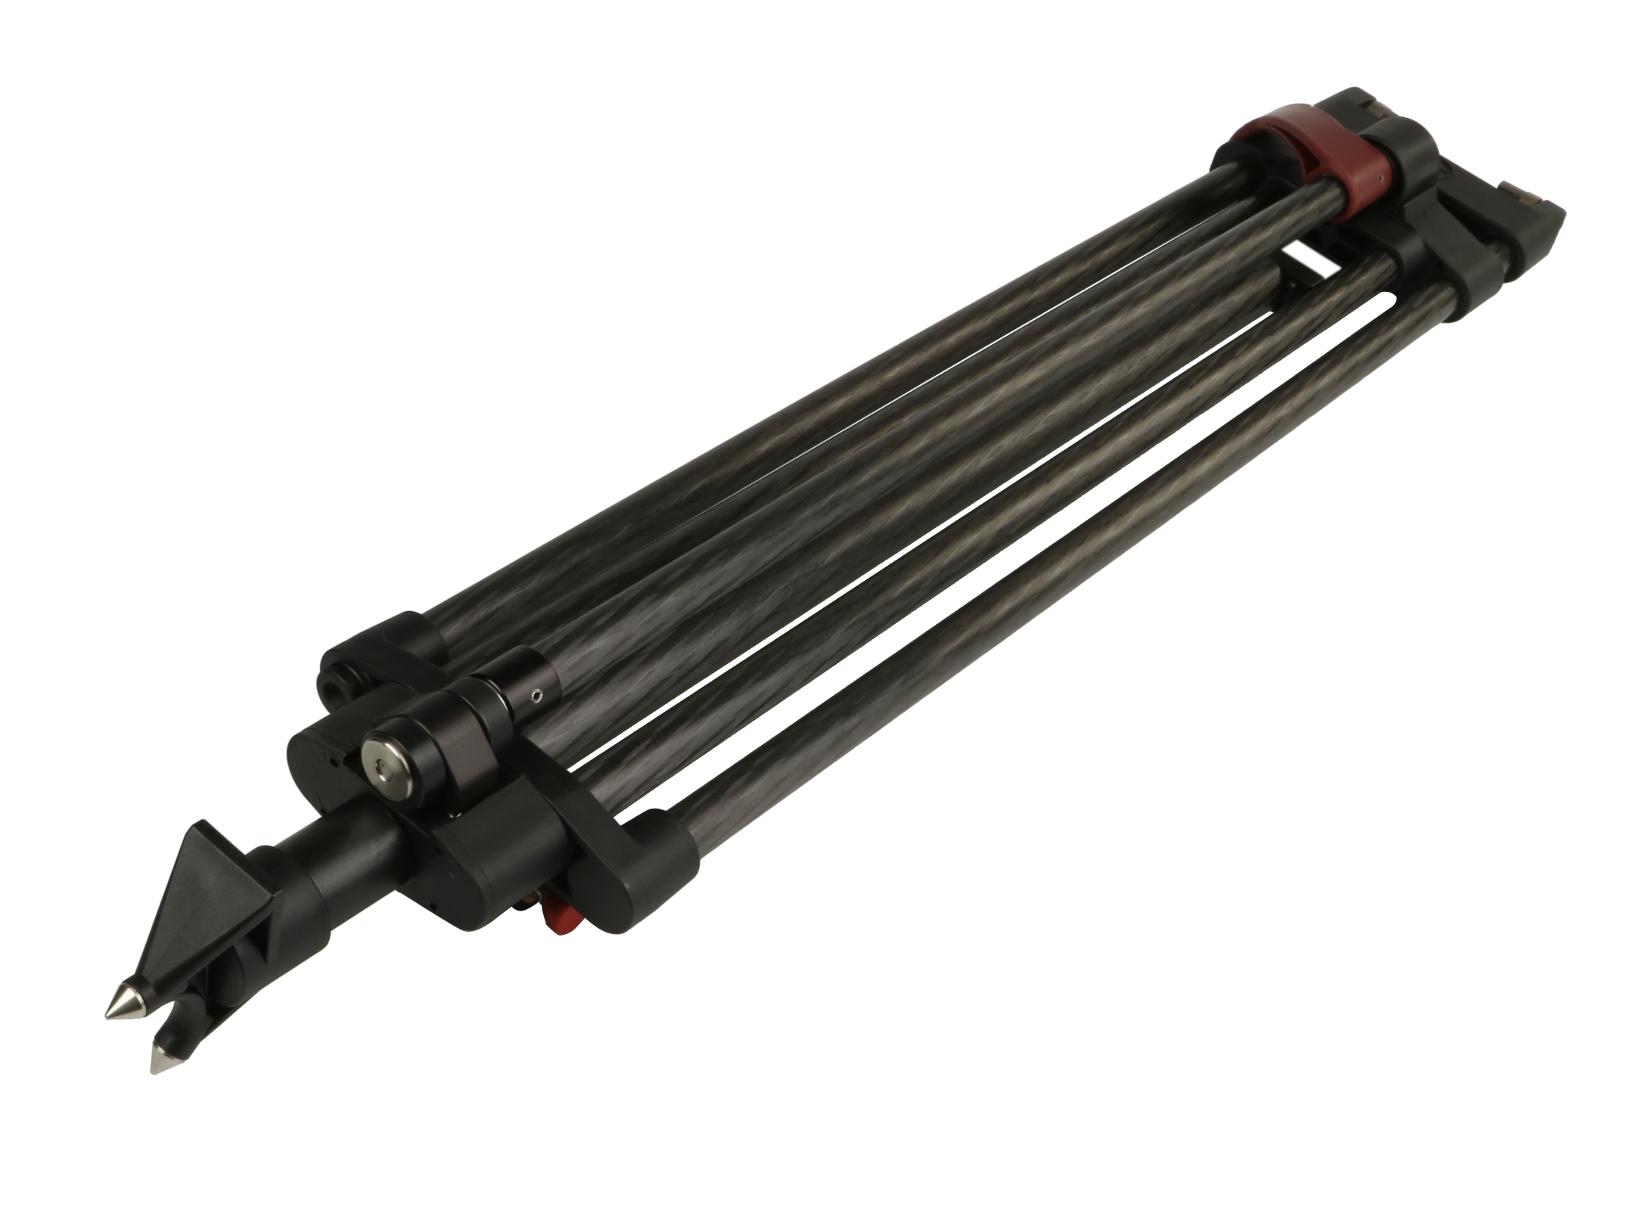 Complete ST100 3 Tripod Leg for FSB 6